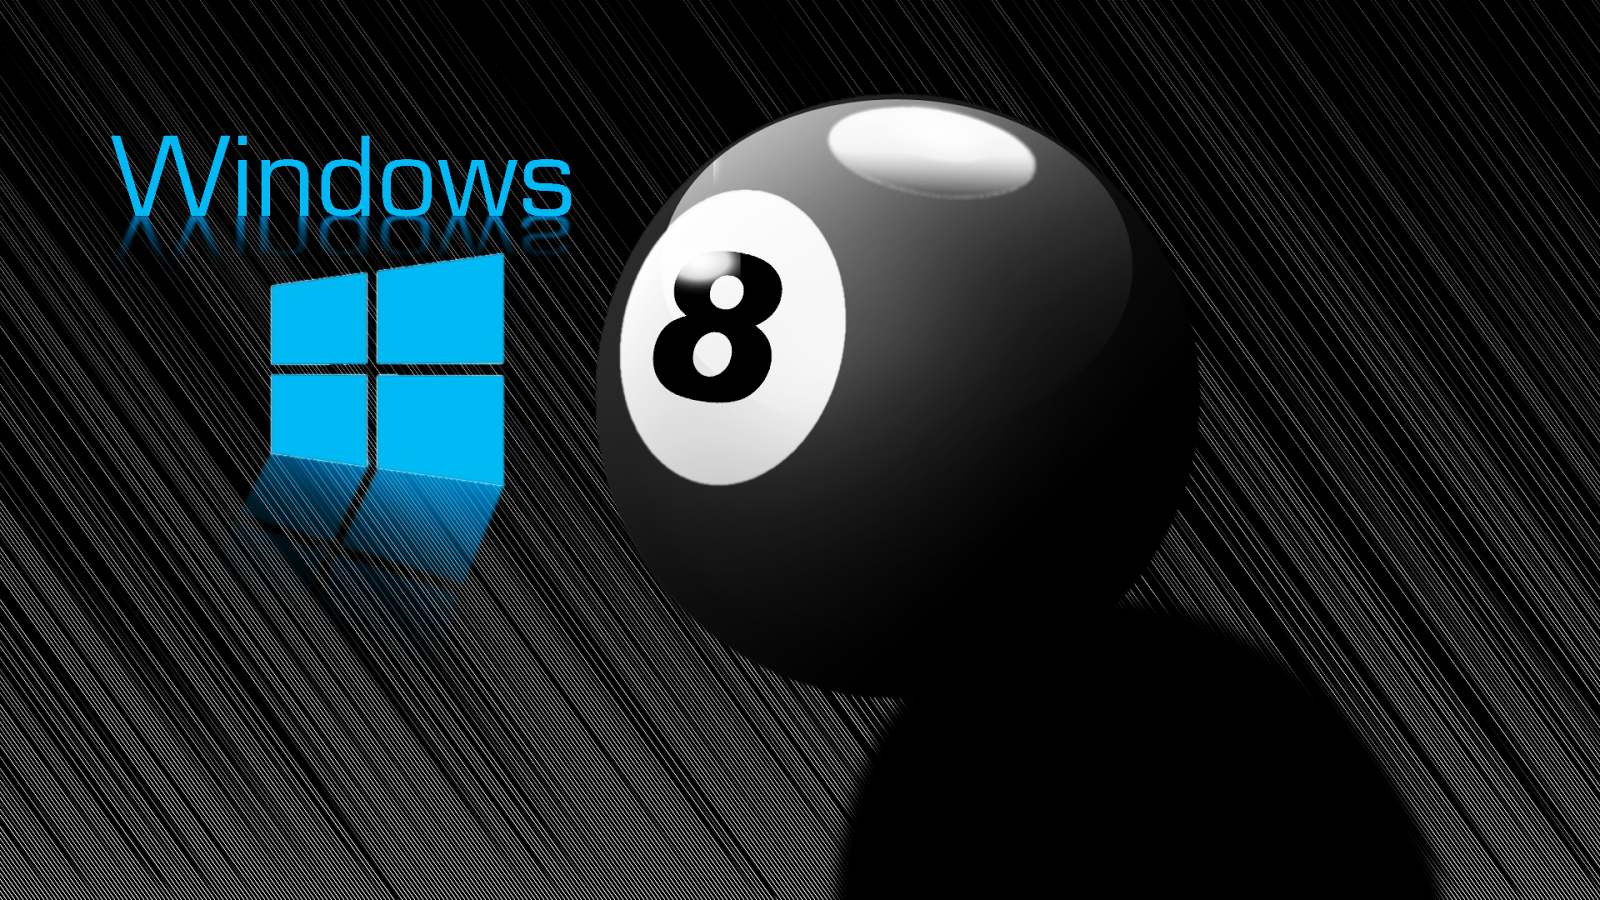 Free Download Wallpaper Hd   Windows 8 New Wallpaper Hd